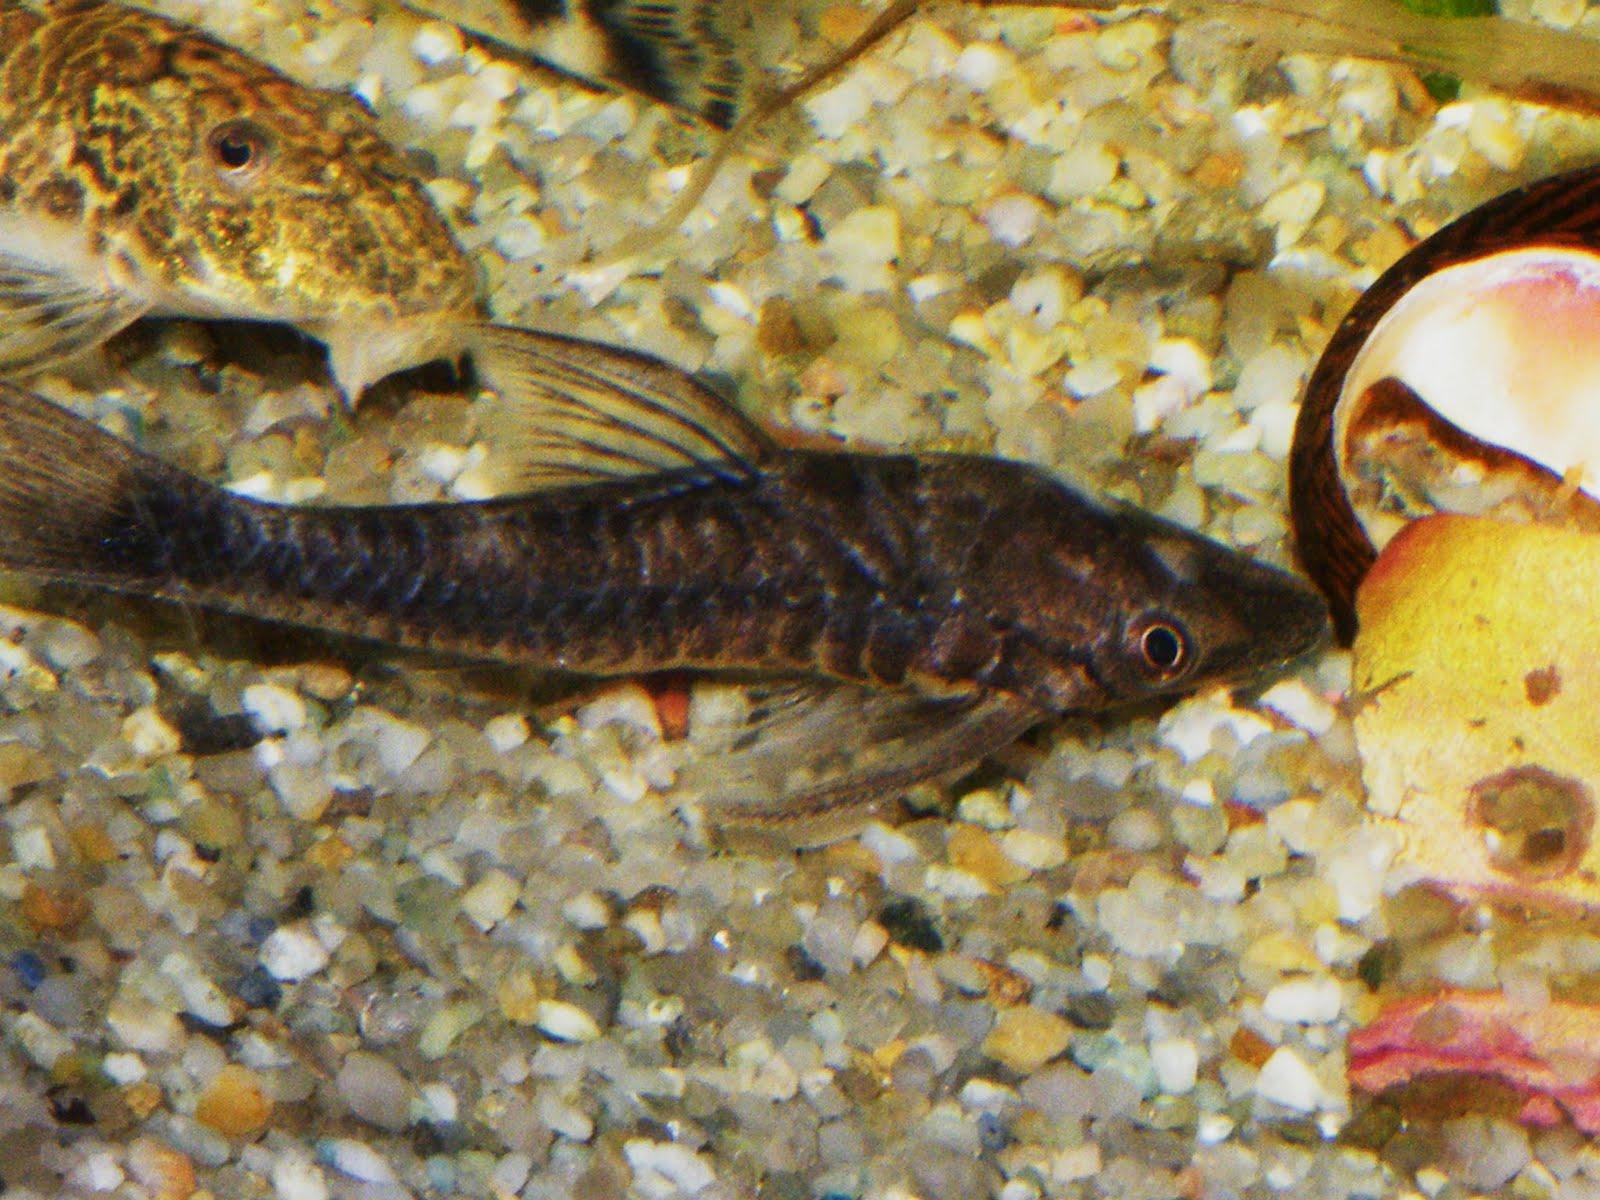 Oceanaq vampire oto otocinclus vampiro new rare for Vampire fish for sale